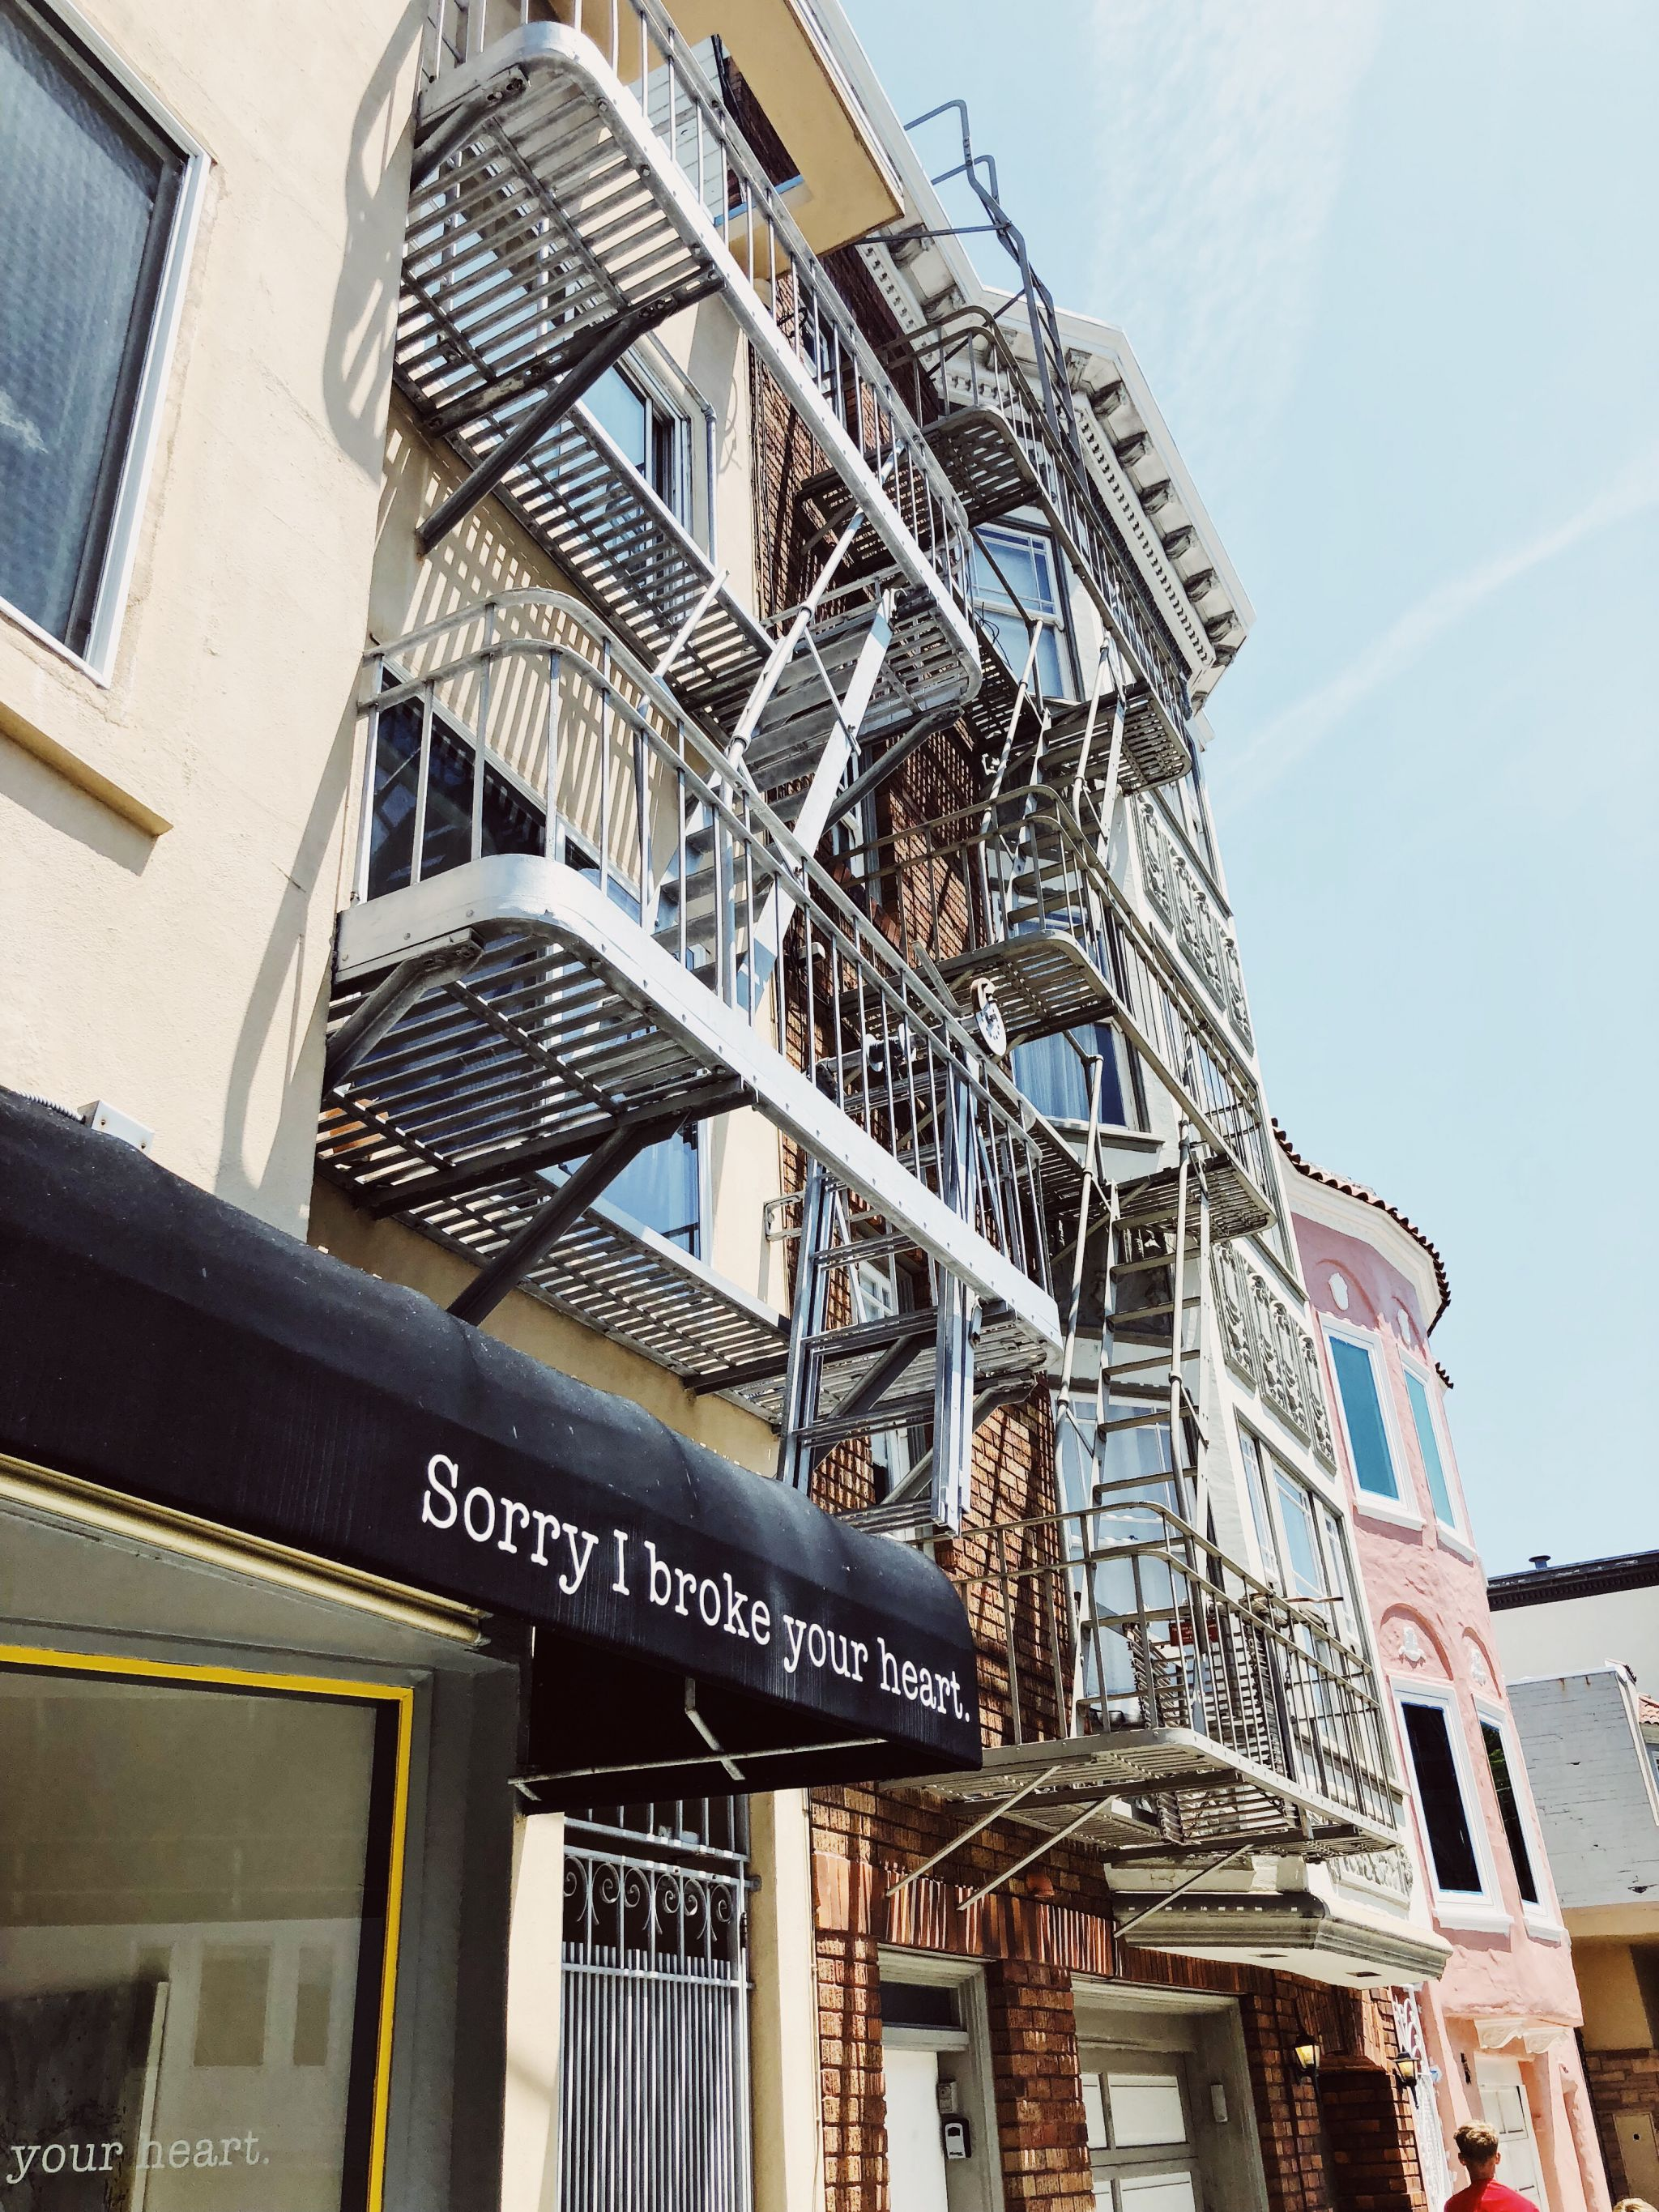 Die Marina/ Chestnut Street Gegend in San Francisco - Nowshine ü40 Reiseblog - Sorry I broke your heart